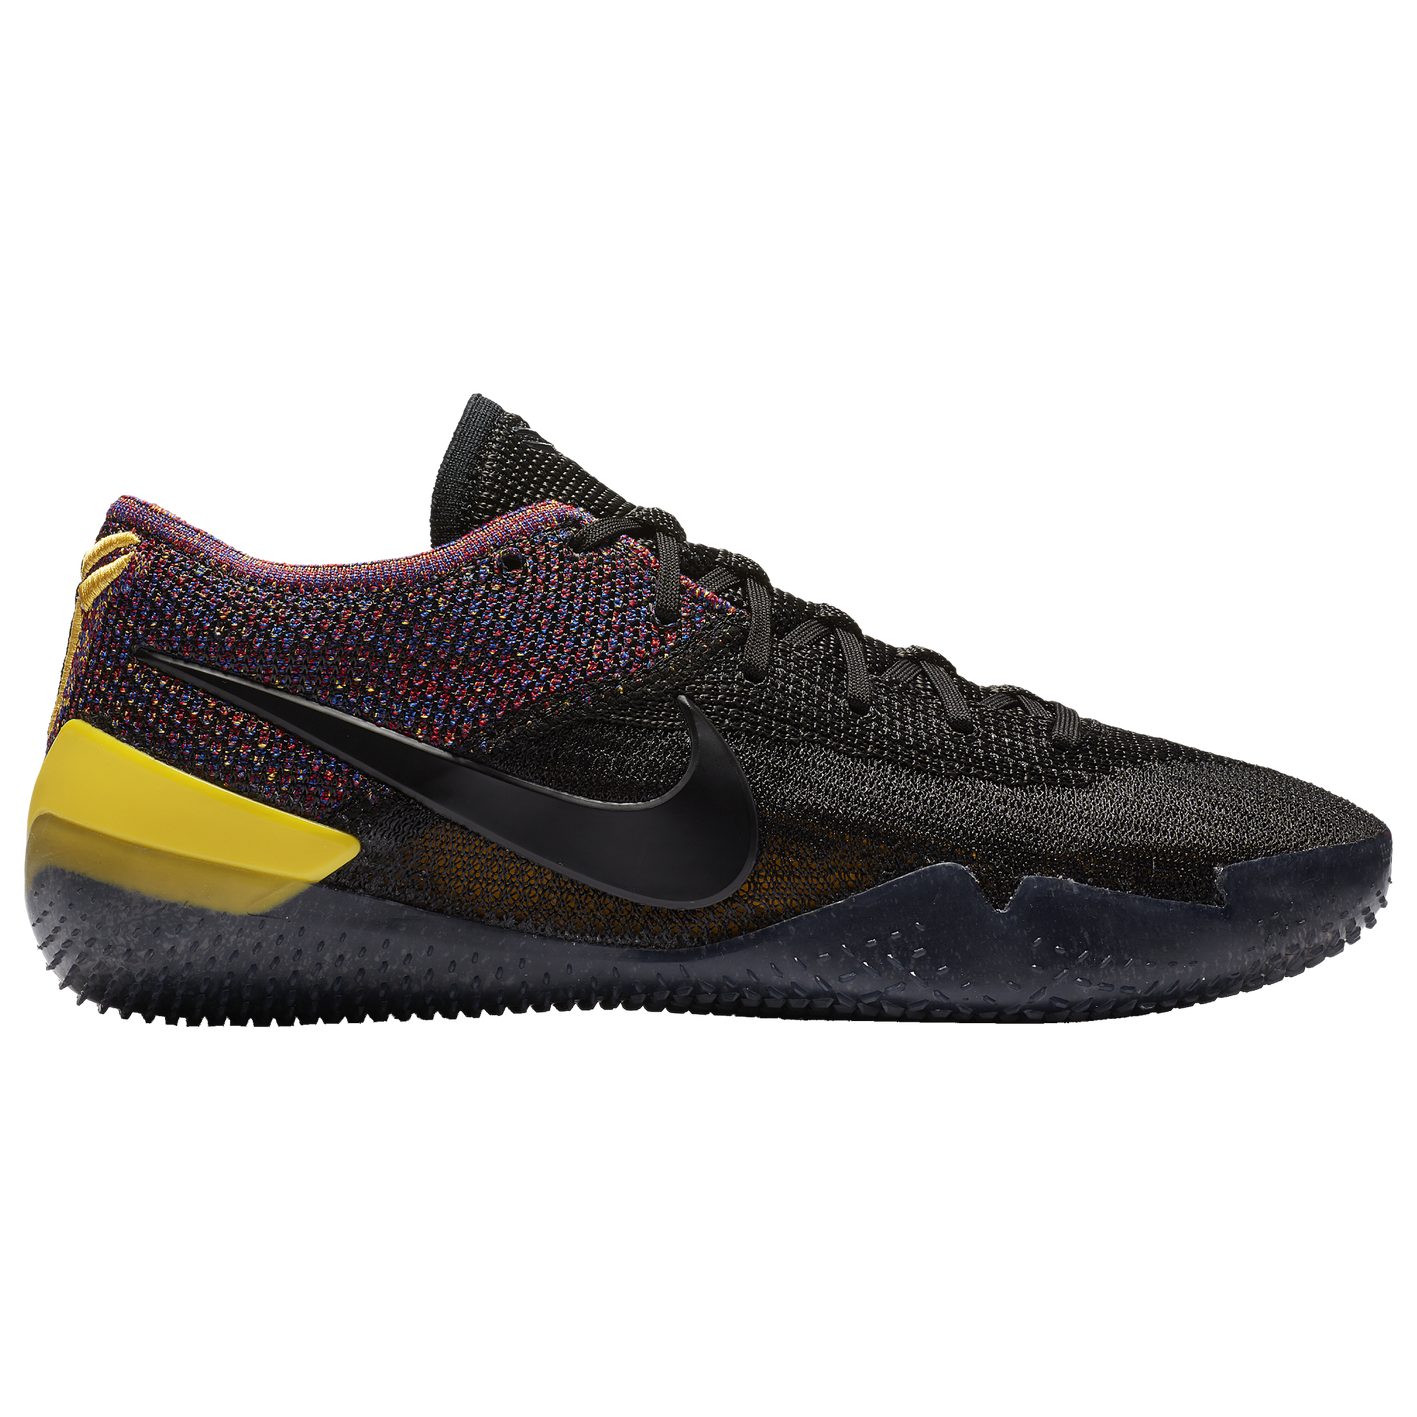 b844a397bd91 Nike Kobe AD NXT 360 - Men s - Basketball - Shoes - Bryant